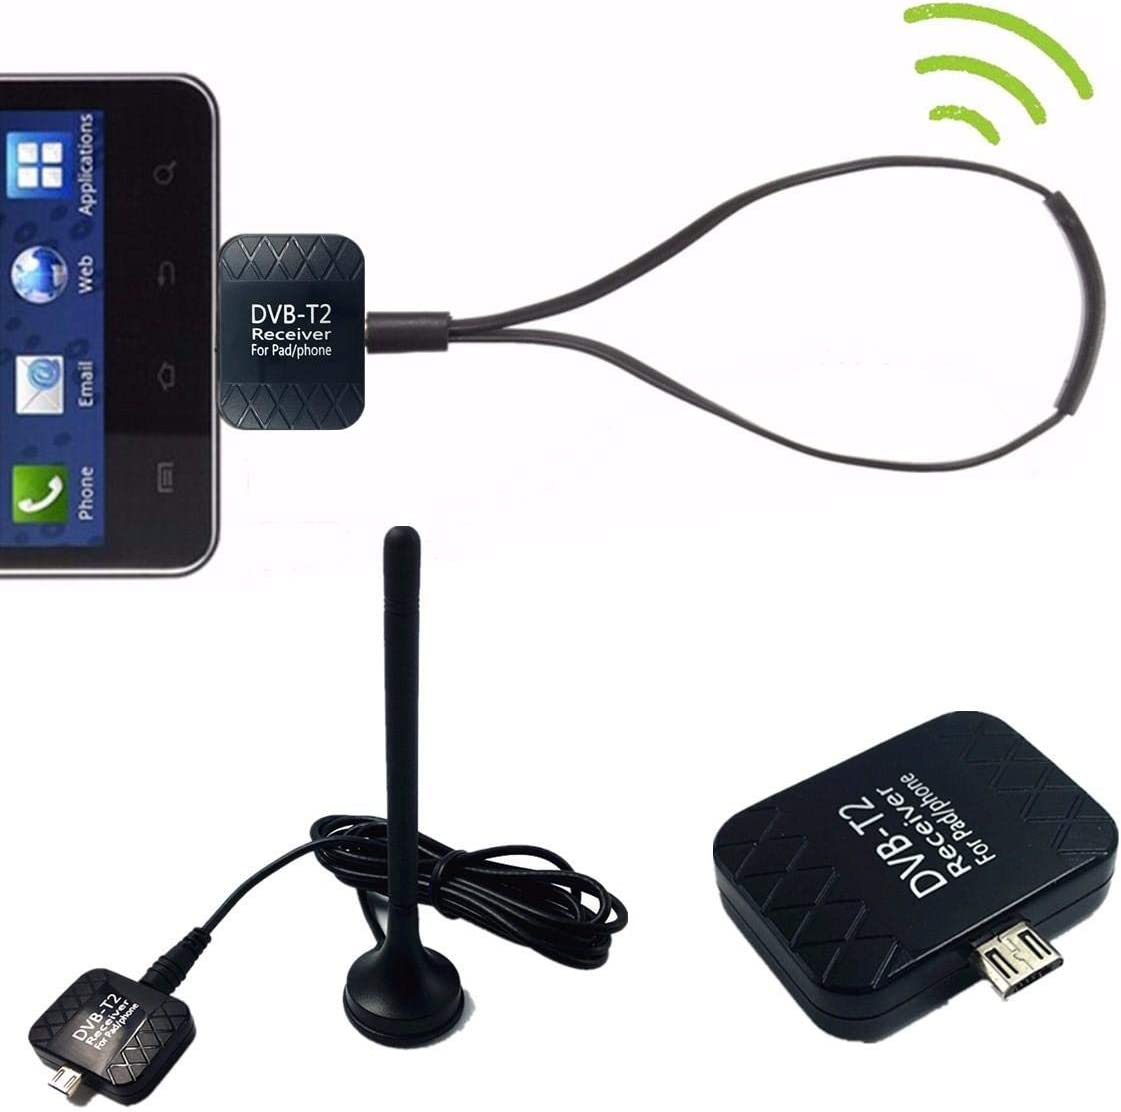 Micro USB DVB-T2 DTV Link USB Digital TV Receiver Tuner ...